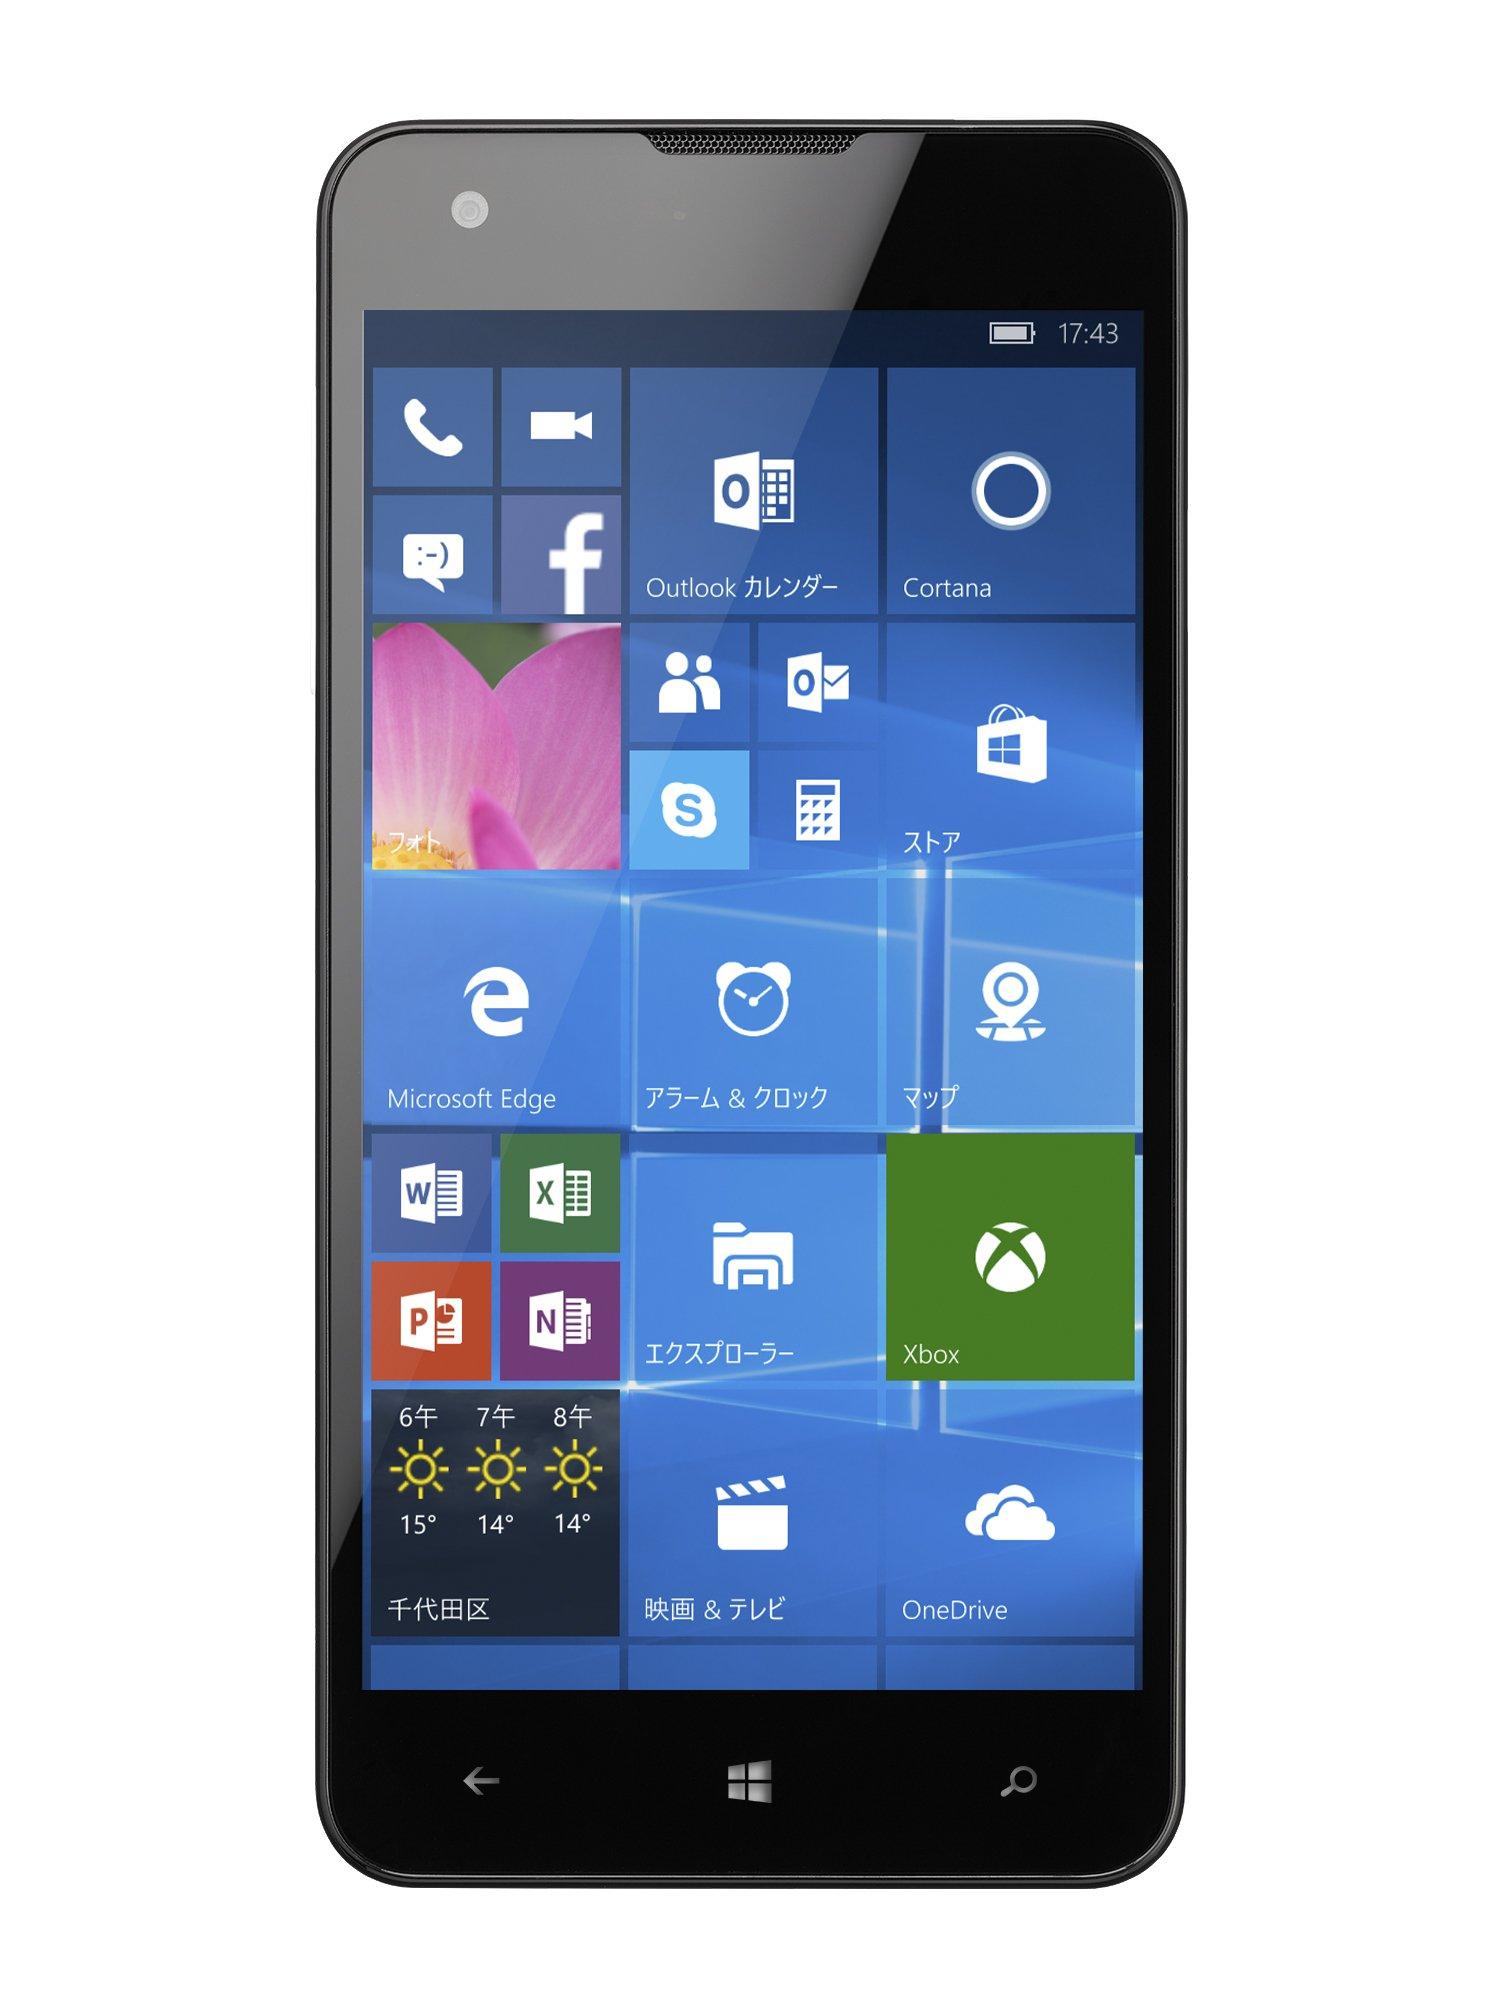 Windows 10 Mobile搭載のWindows Phone端末